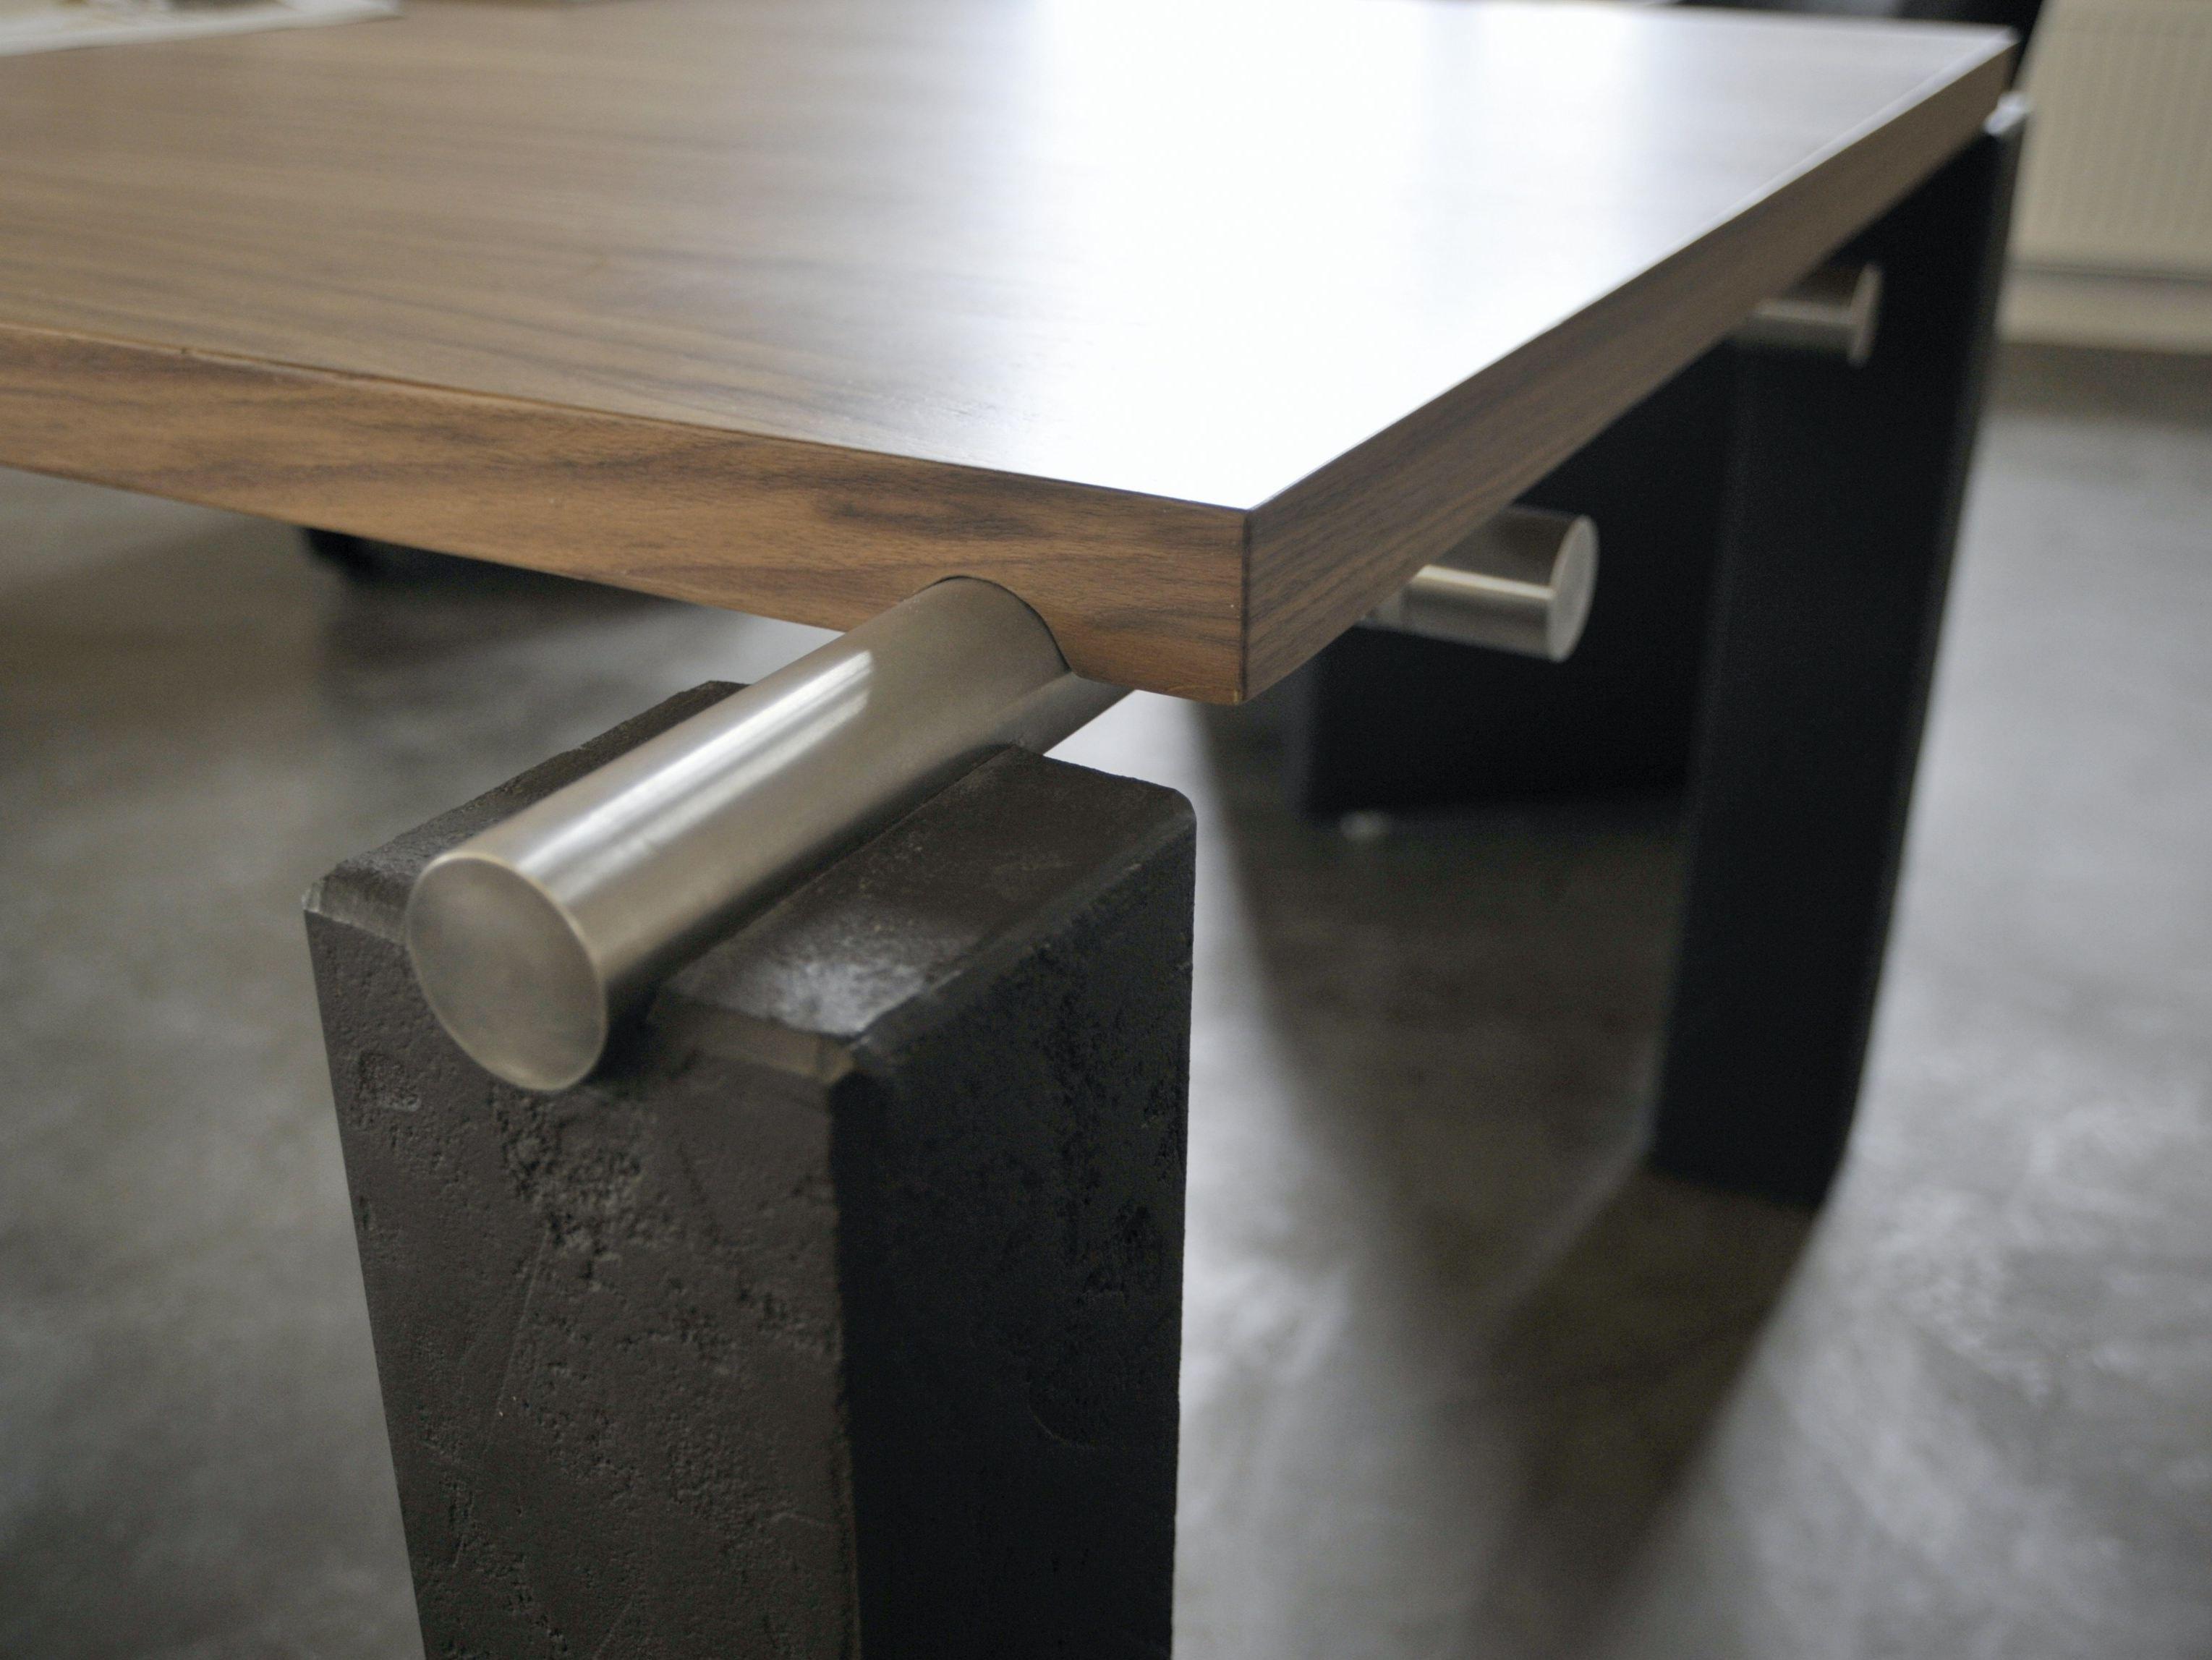 604 table by wissmann raumobjekte. Black Bedroom Furniture Sets. Home Design Ideas